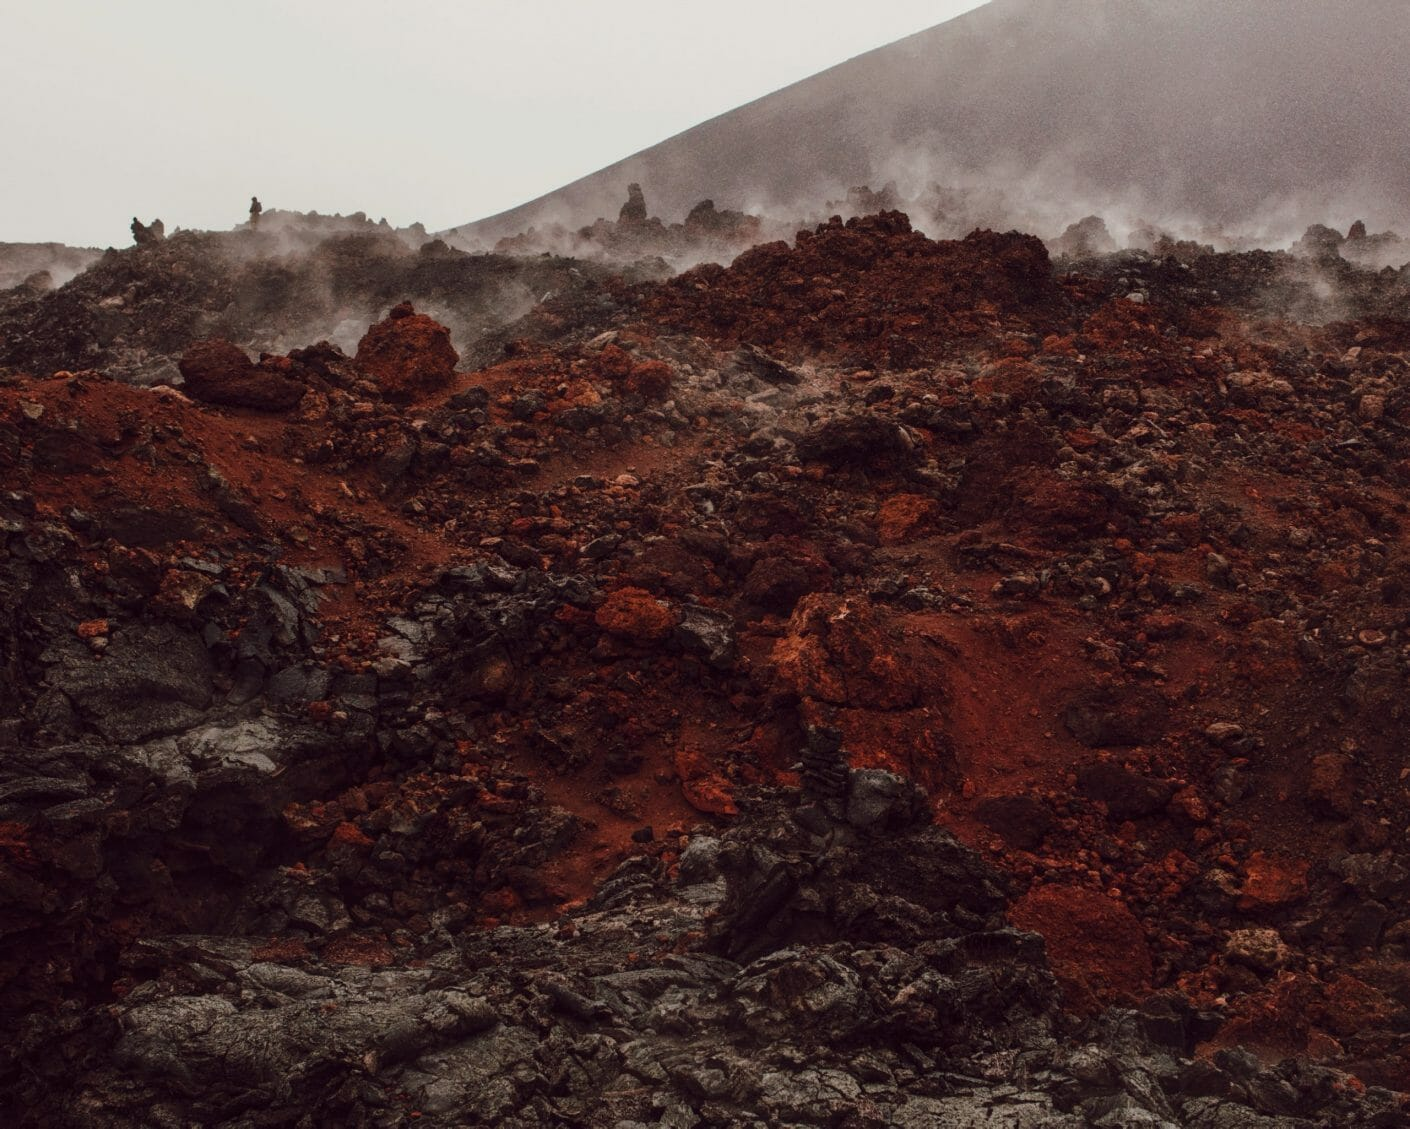 Flan d'un volcan, une sorte de brouillard s'élève